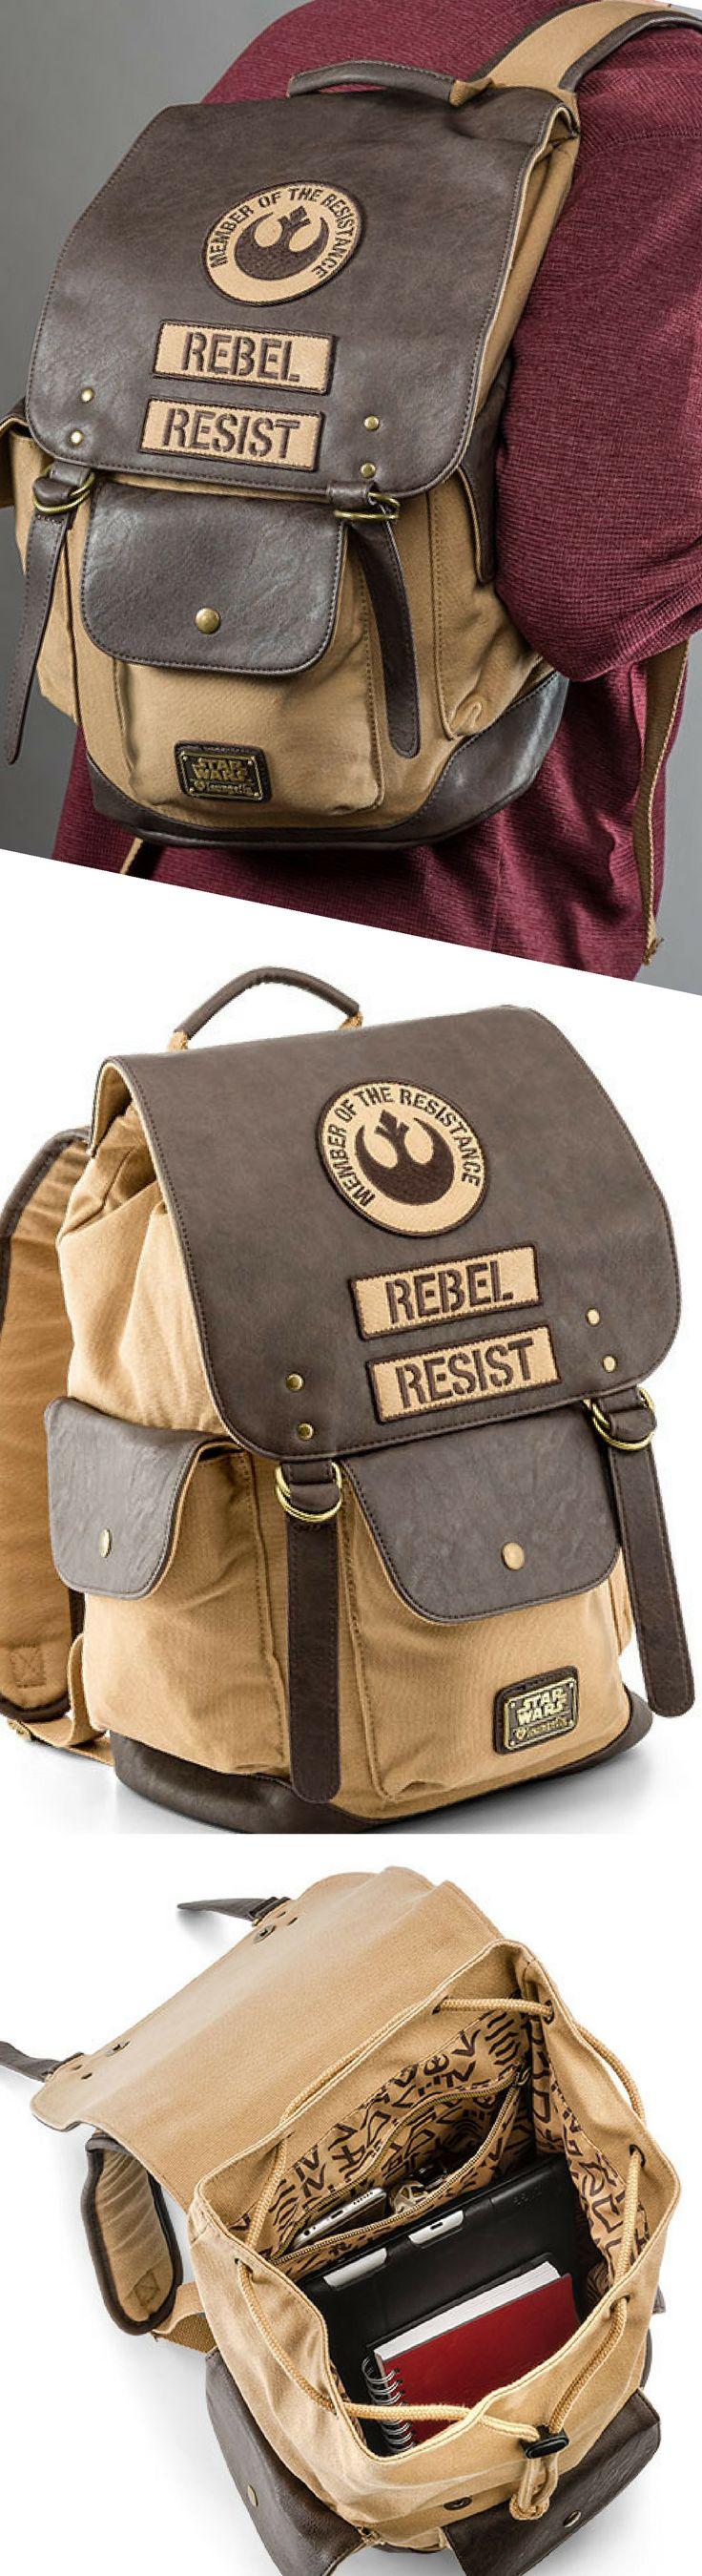 Star Wars Rebel Leather Backpack - Star Wars Gift #starwars #backpacks #rebel